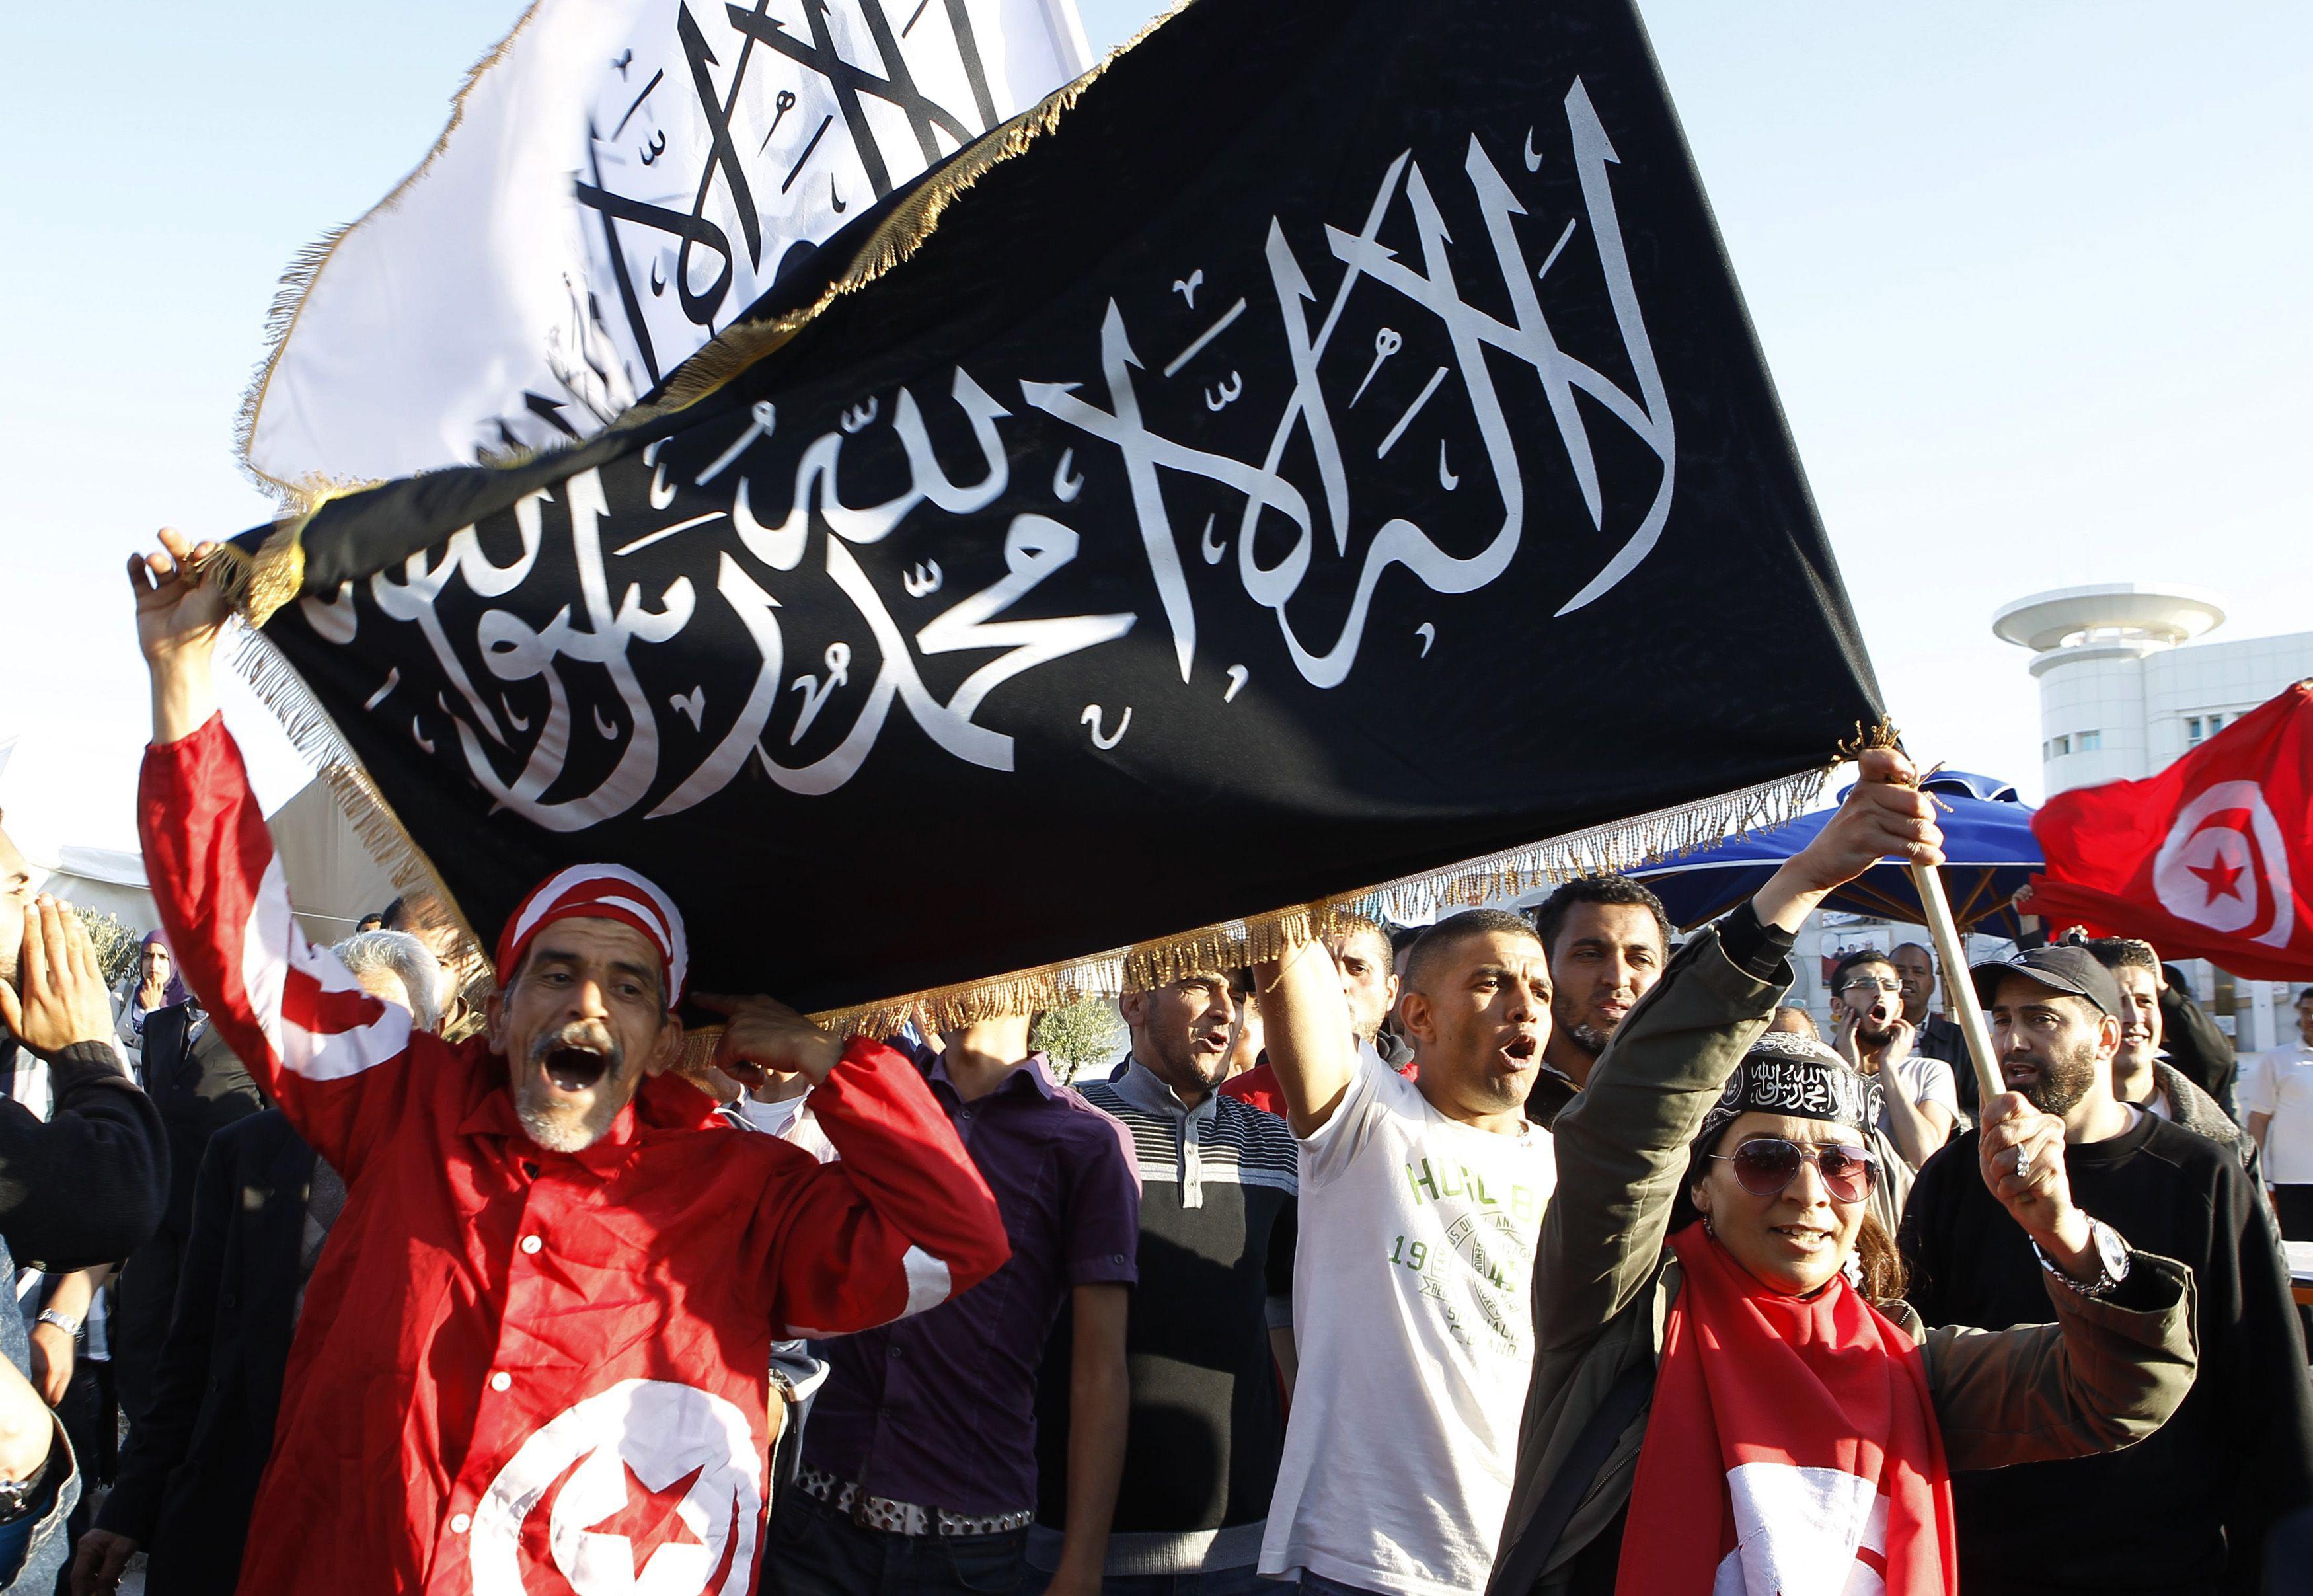 https://www.washingtoninstitute.org/sites/default/files/imports/tunisia-islamistsRTR3168R.jpg